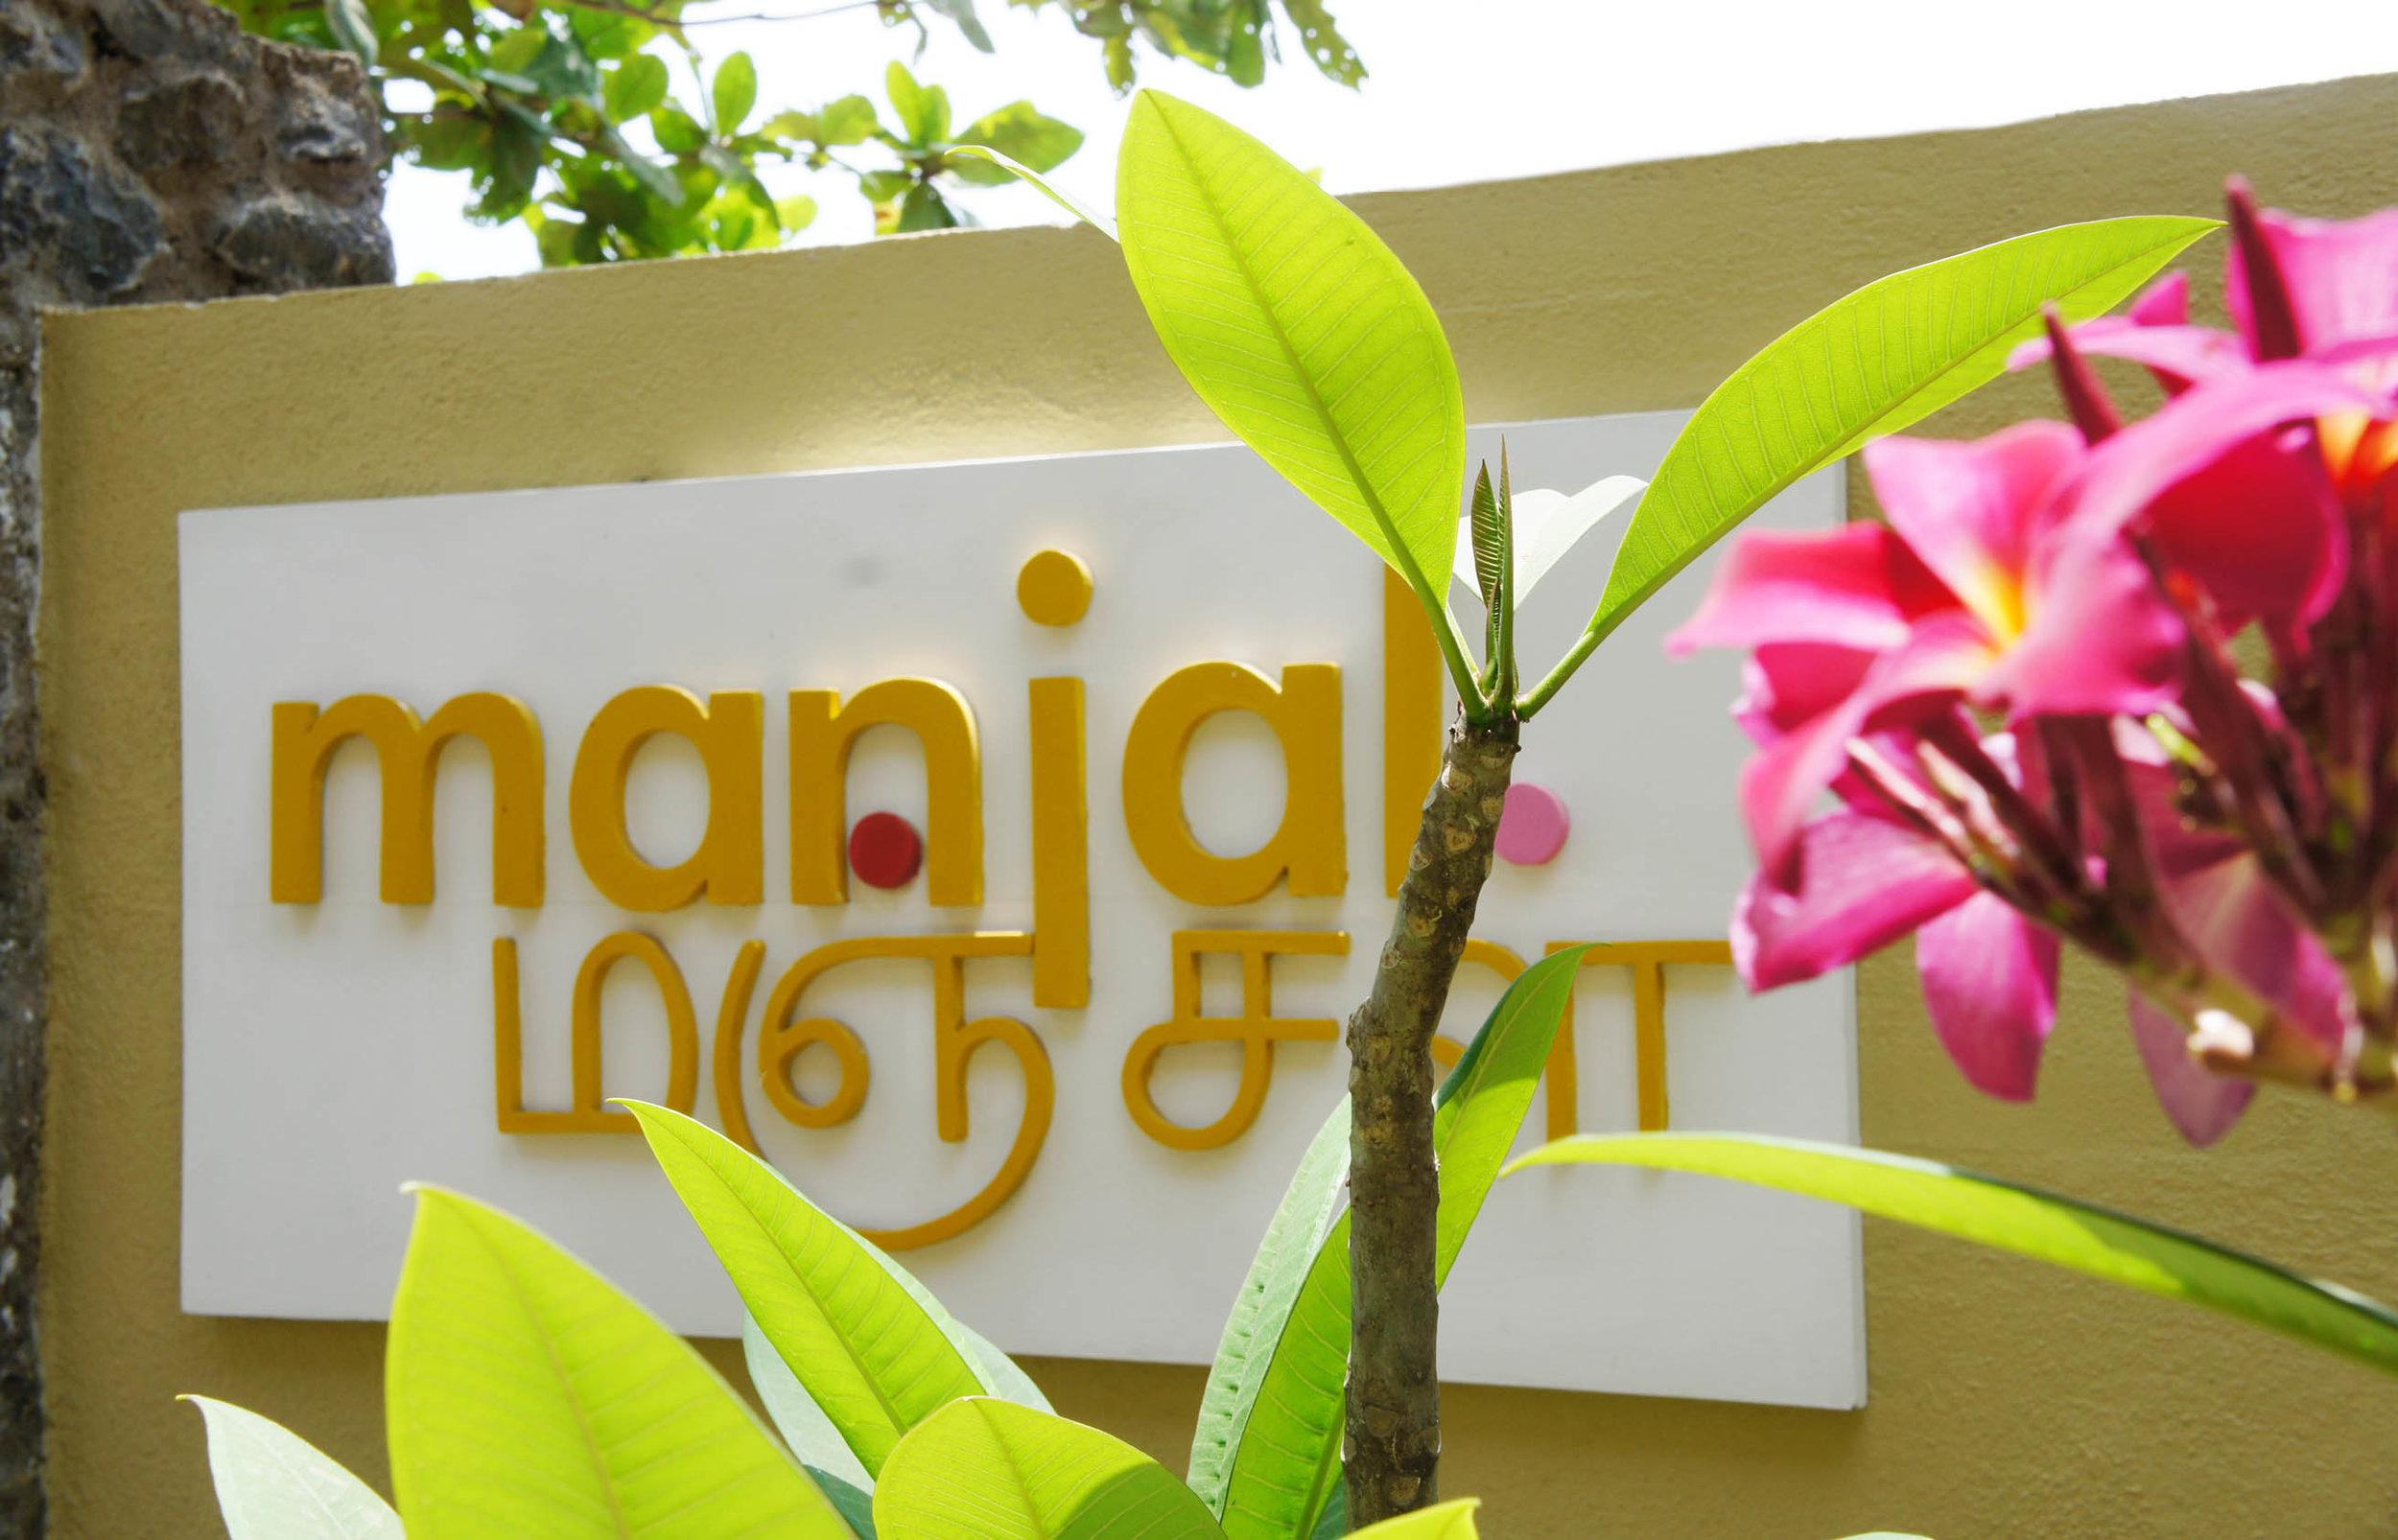 Photo Courtesy M.Rm.Rm Cultural Foundation